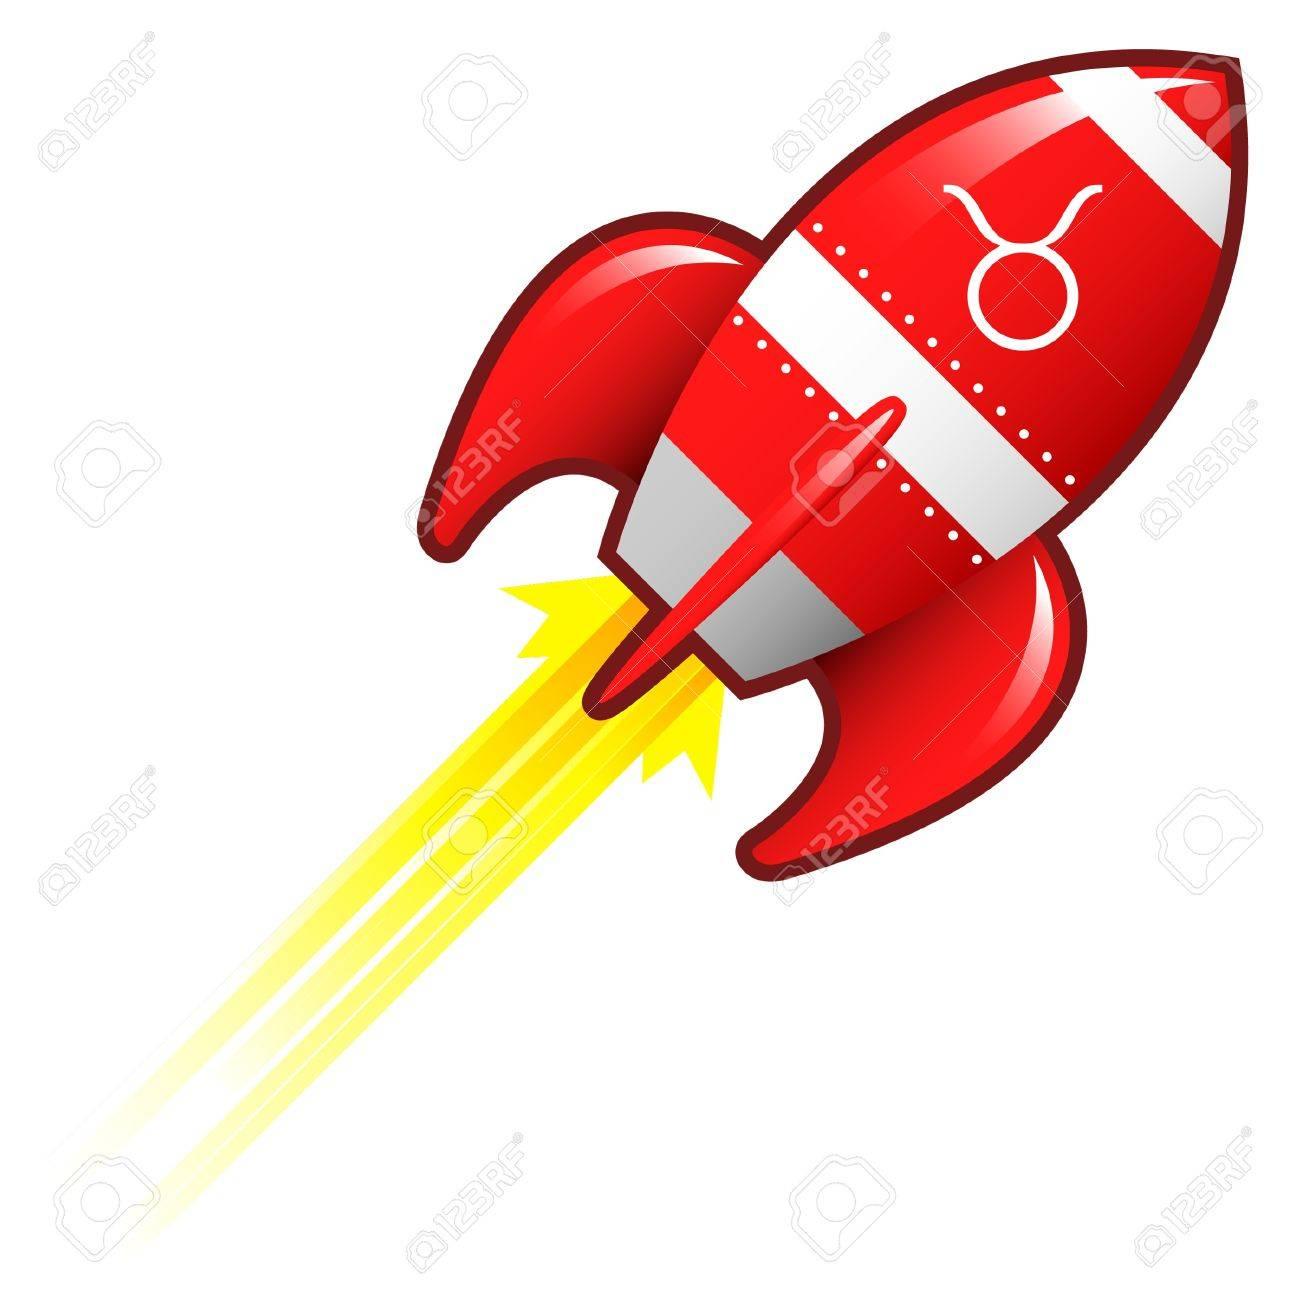 Taurus zodiac astrology sign on on red retro rocket ship illustration Stock Illustration - 14419902